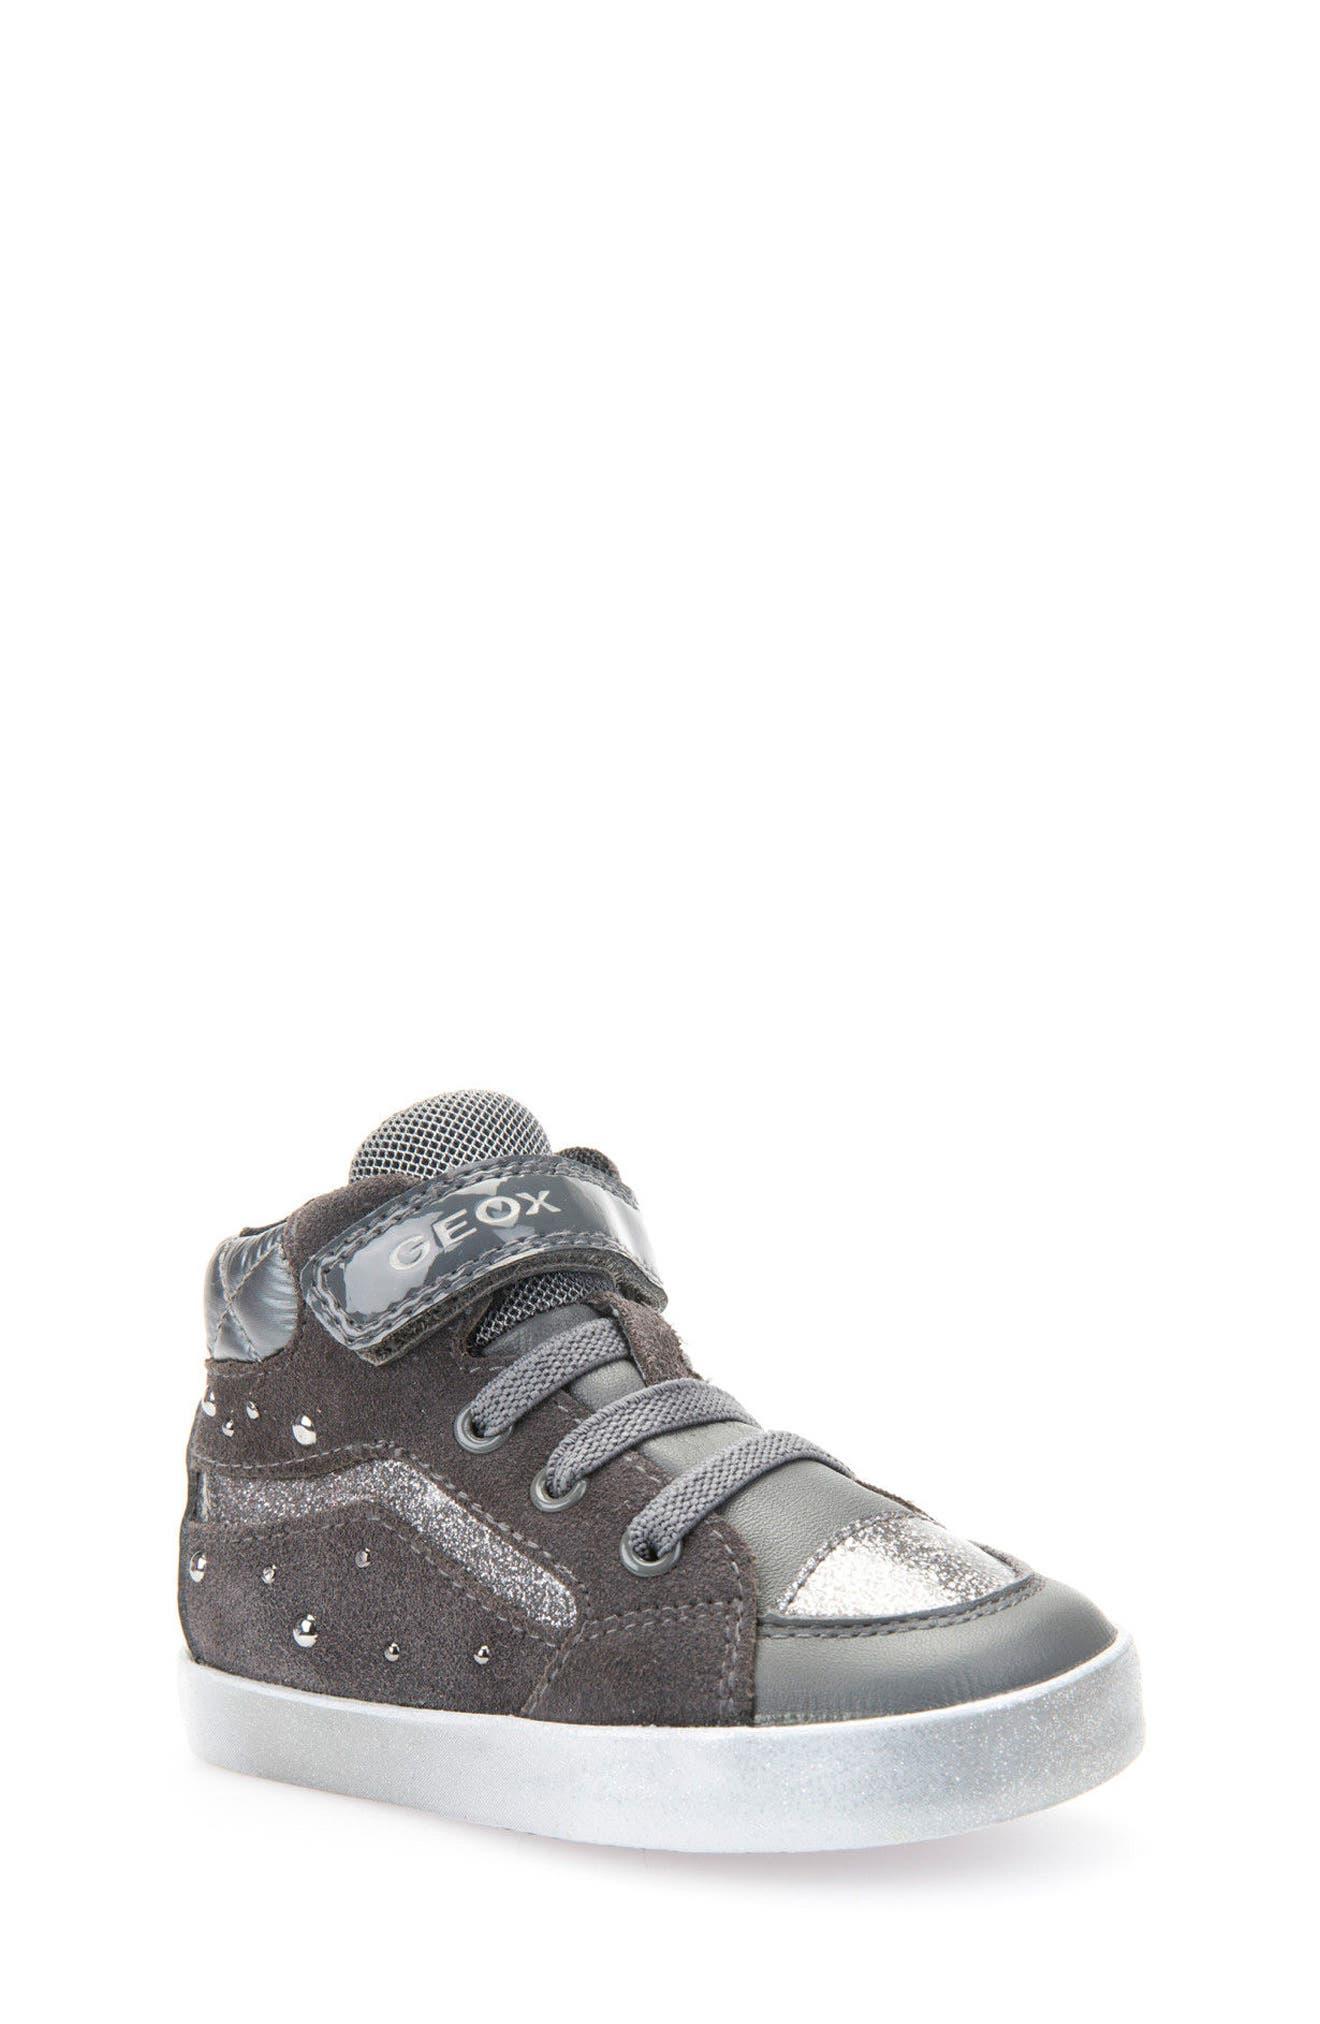 Kiwi Studded High Top Sneaker,                         Main,                         color, 020